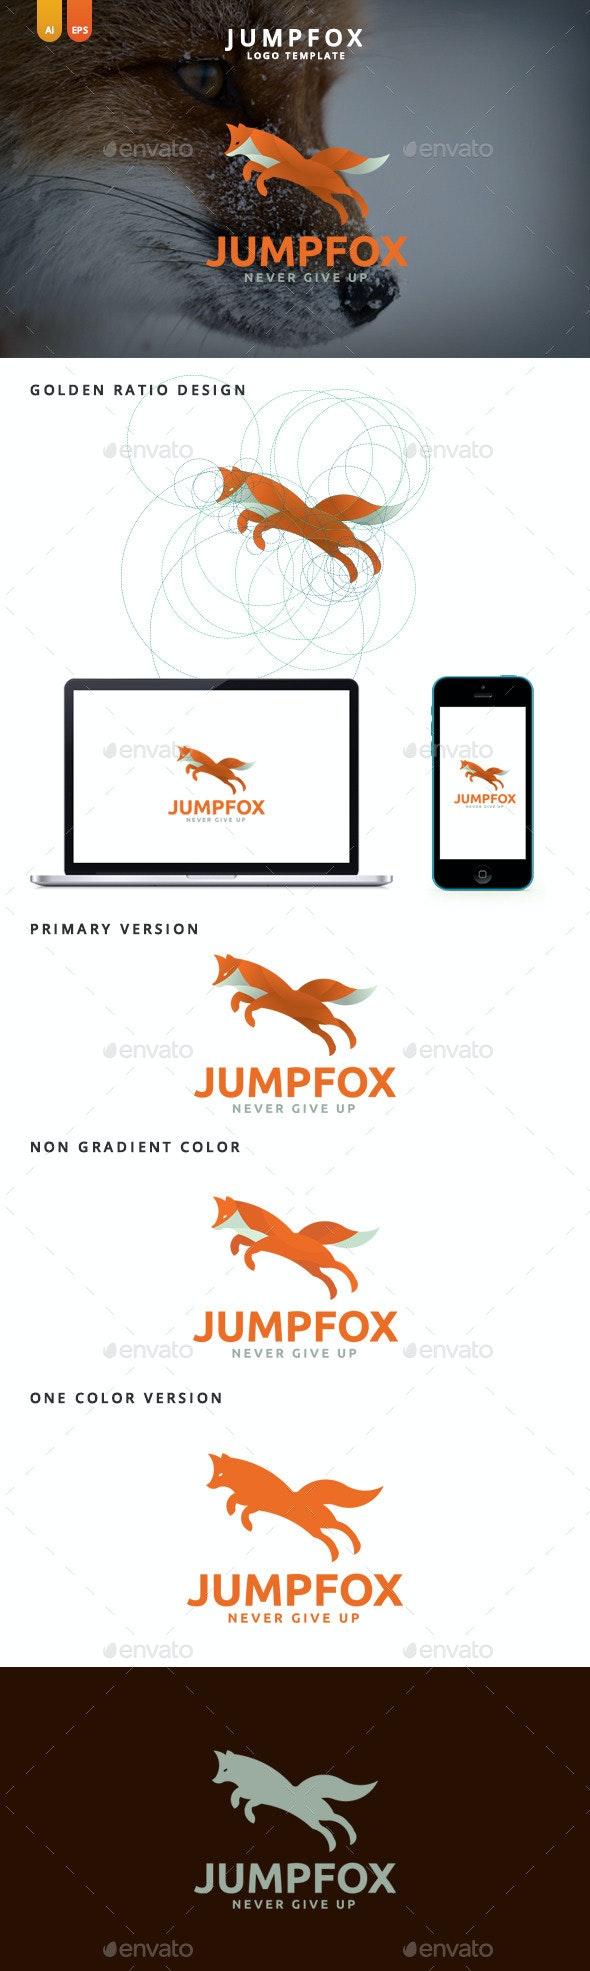 Jump Fox - Professional Fox Logo